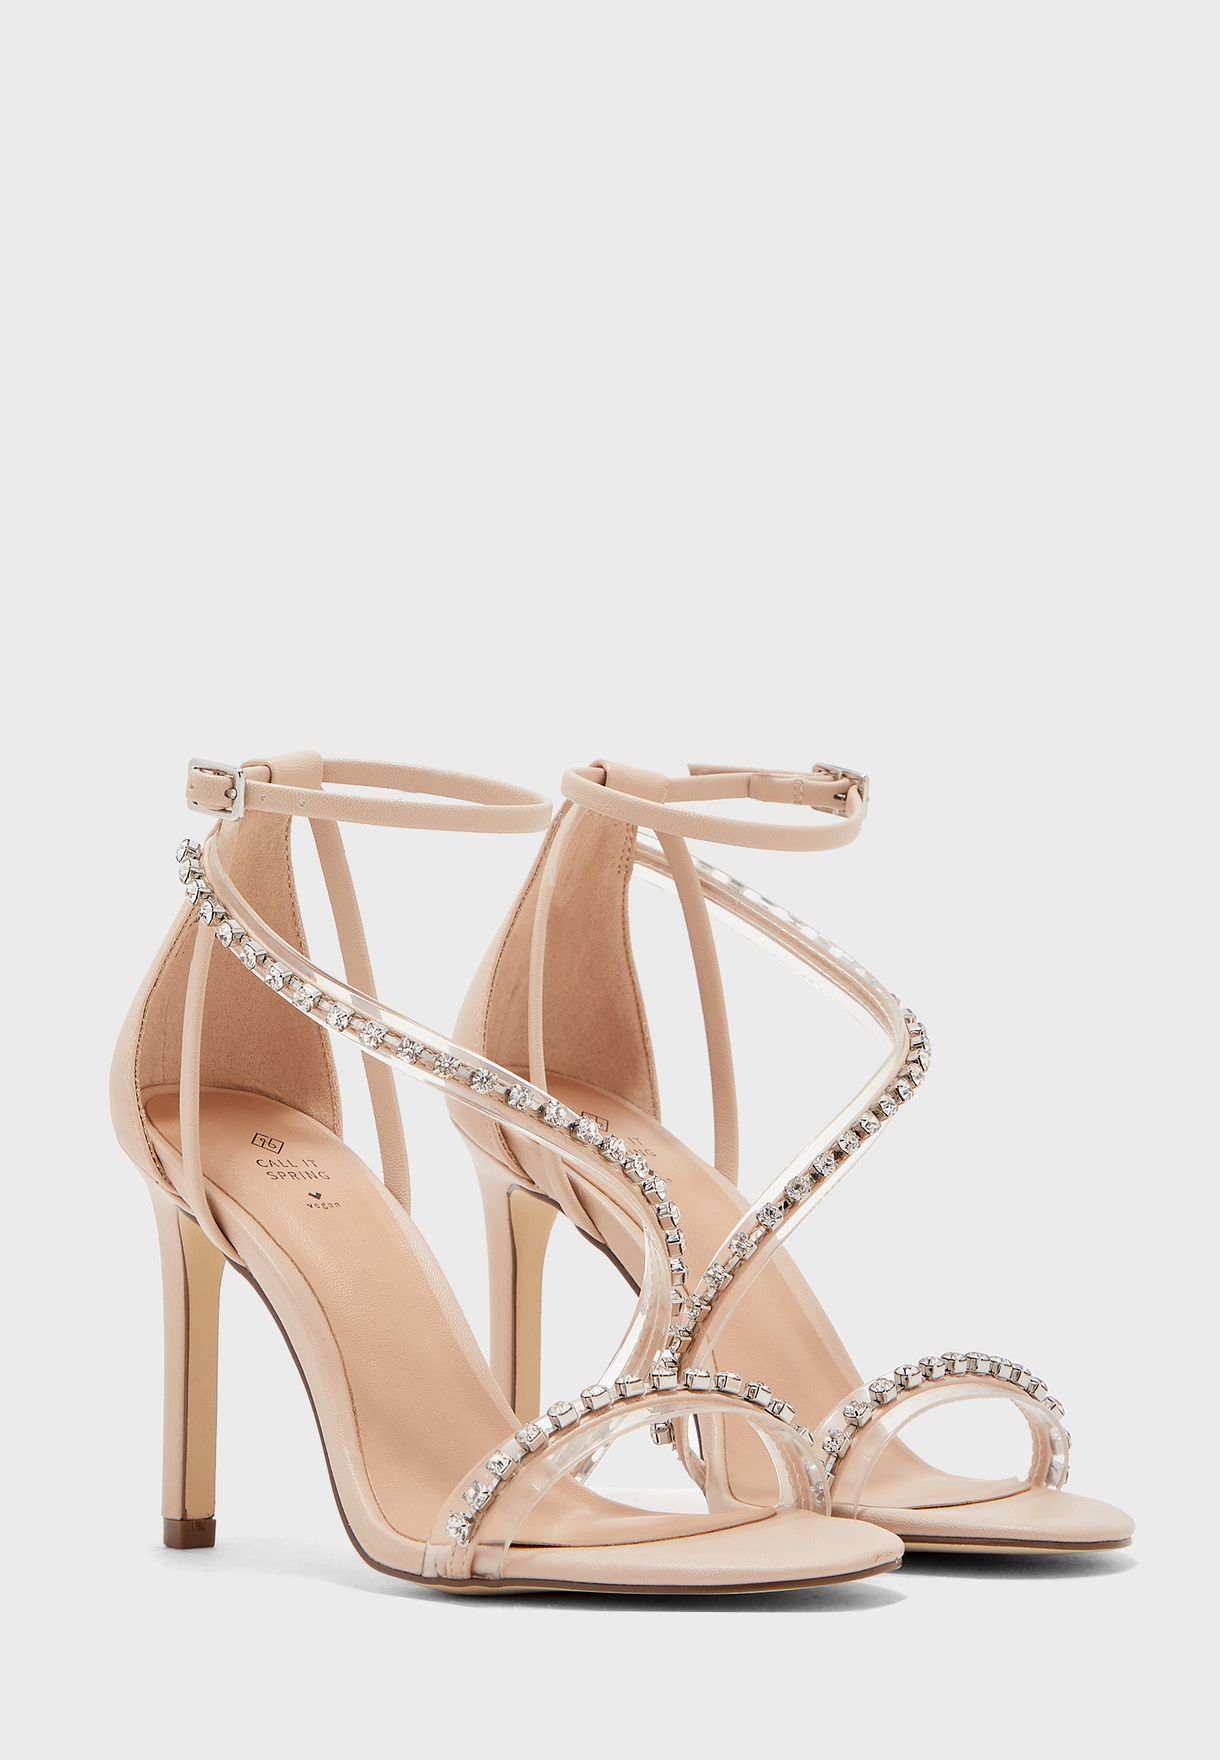 Zihna Sandal